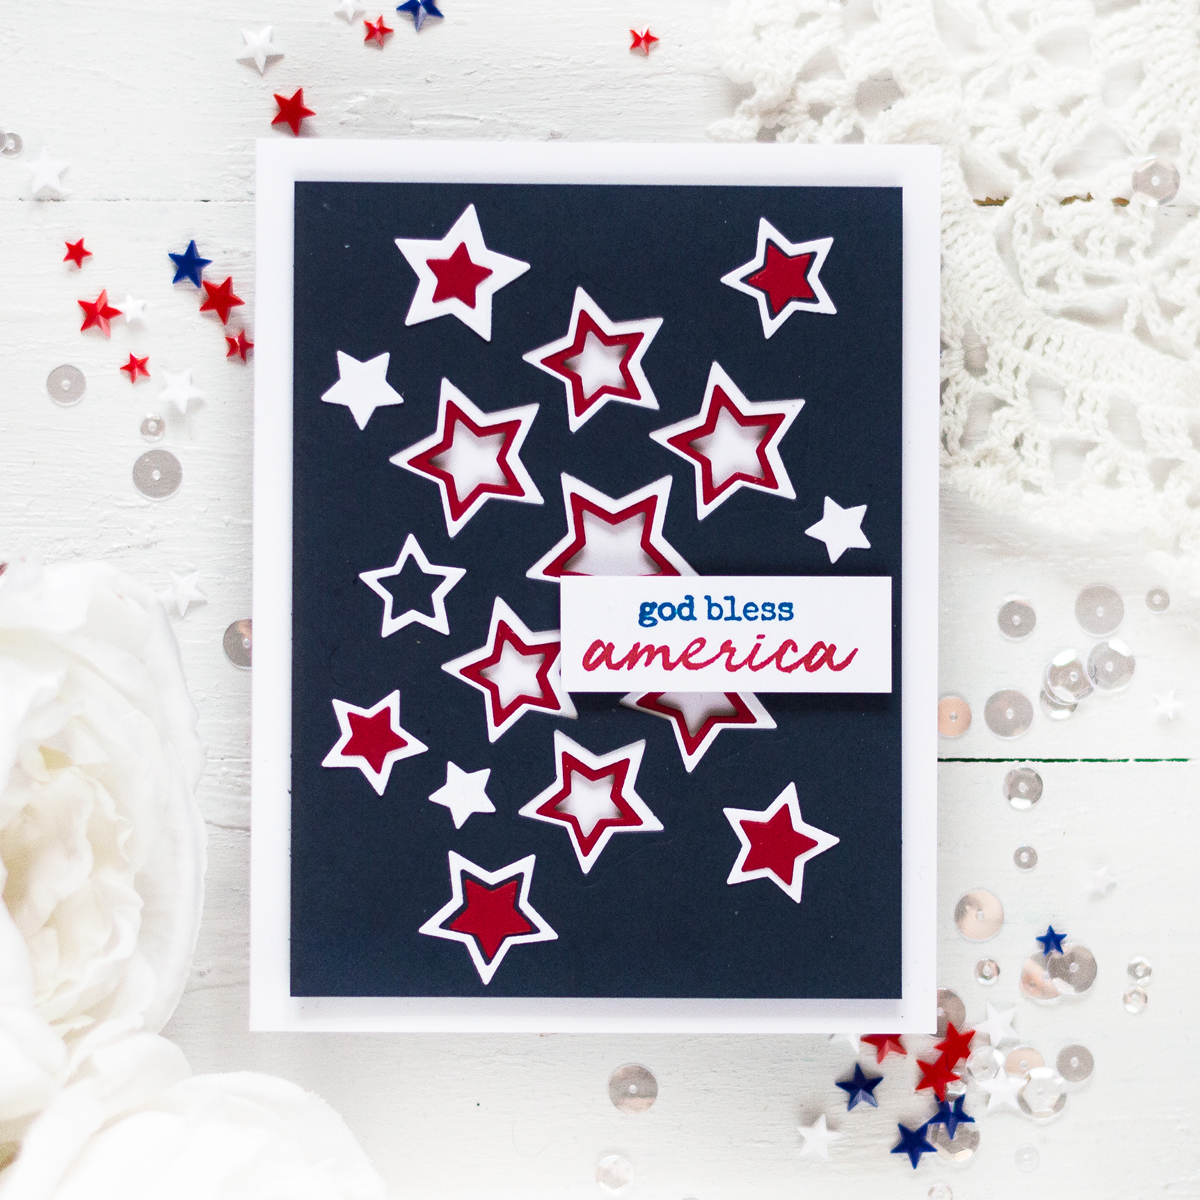 Patriotic Americana $th Of July Card. Card by Svitlana Shayevich